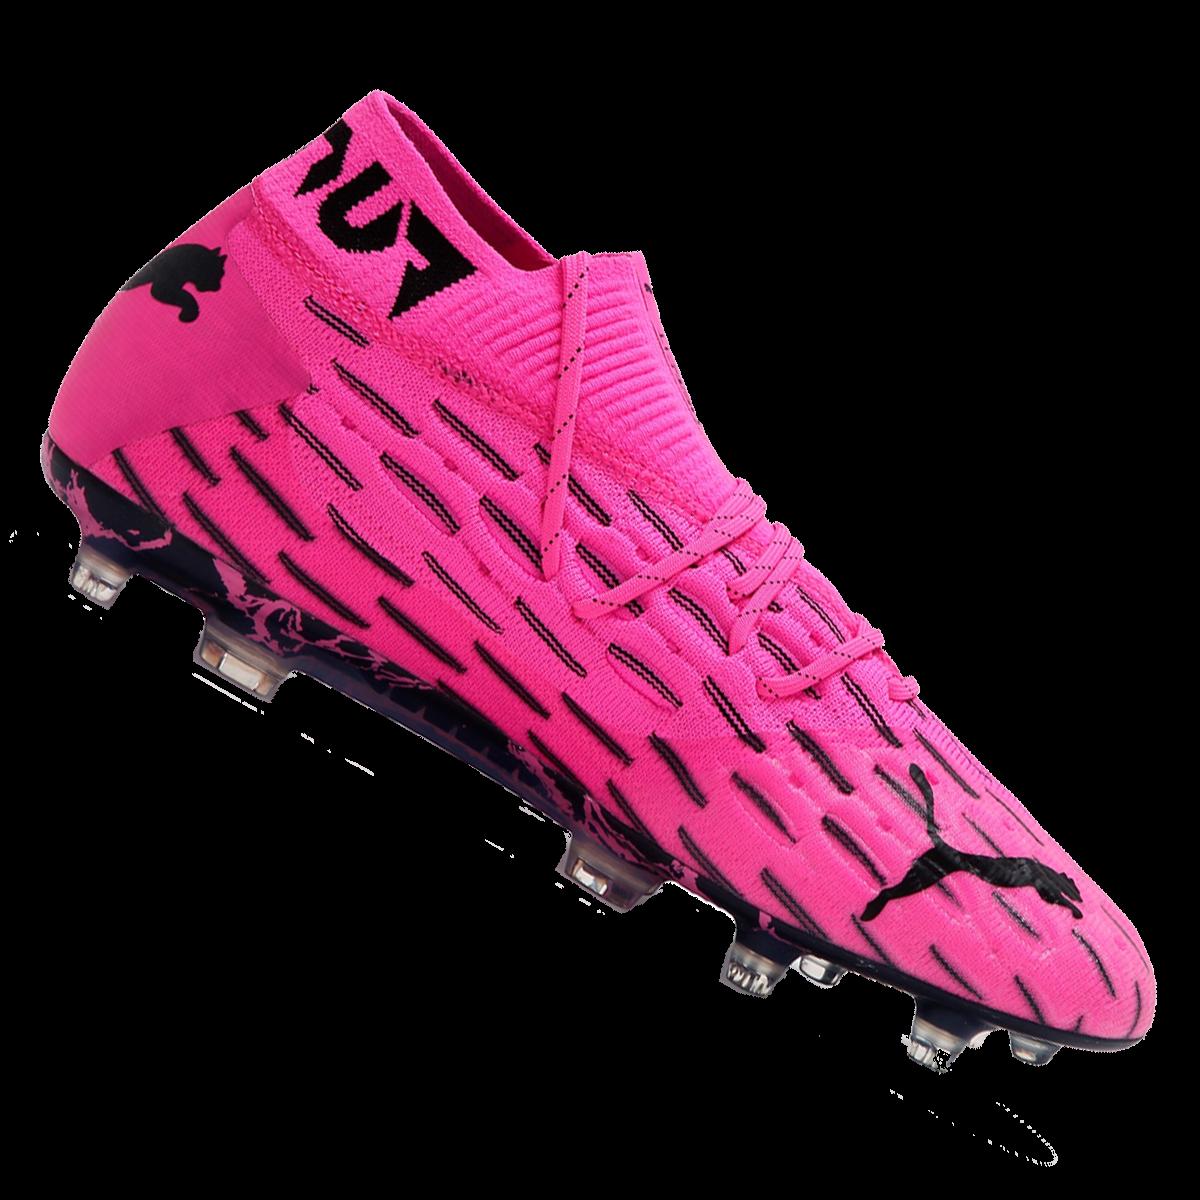 chaussure de foot puma future,mycarrierresources.com